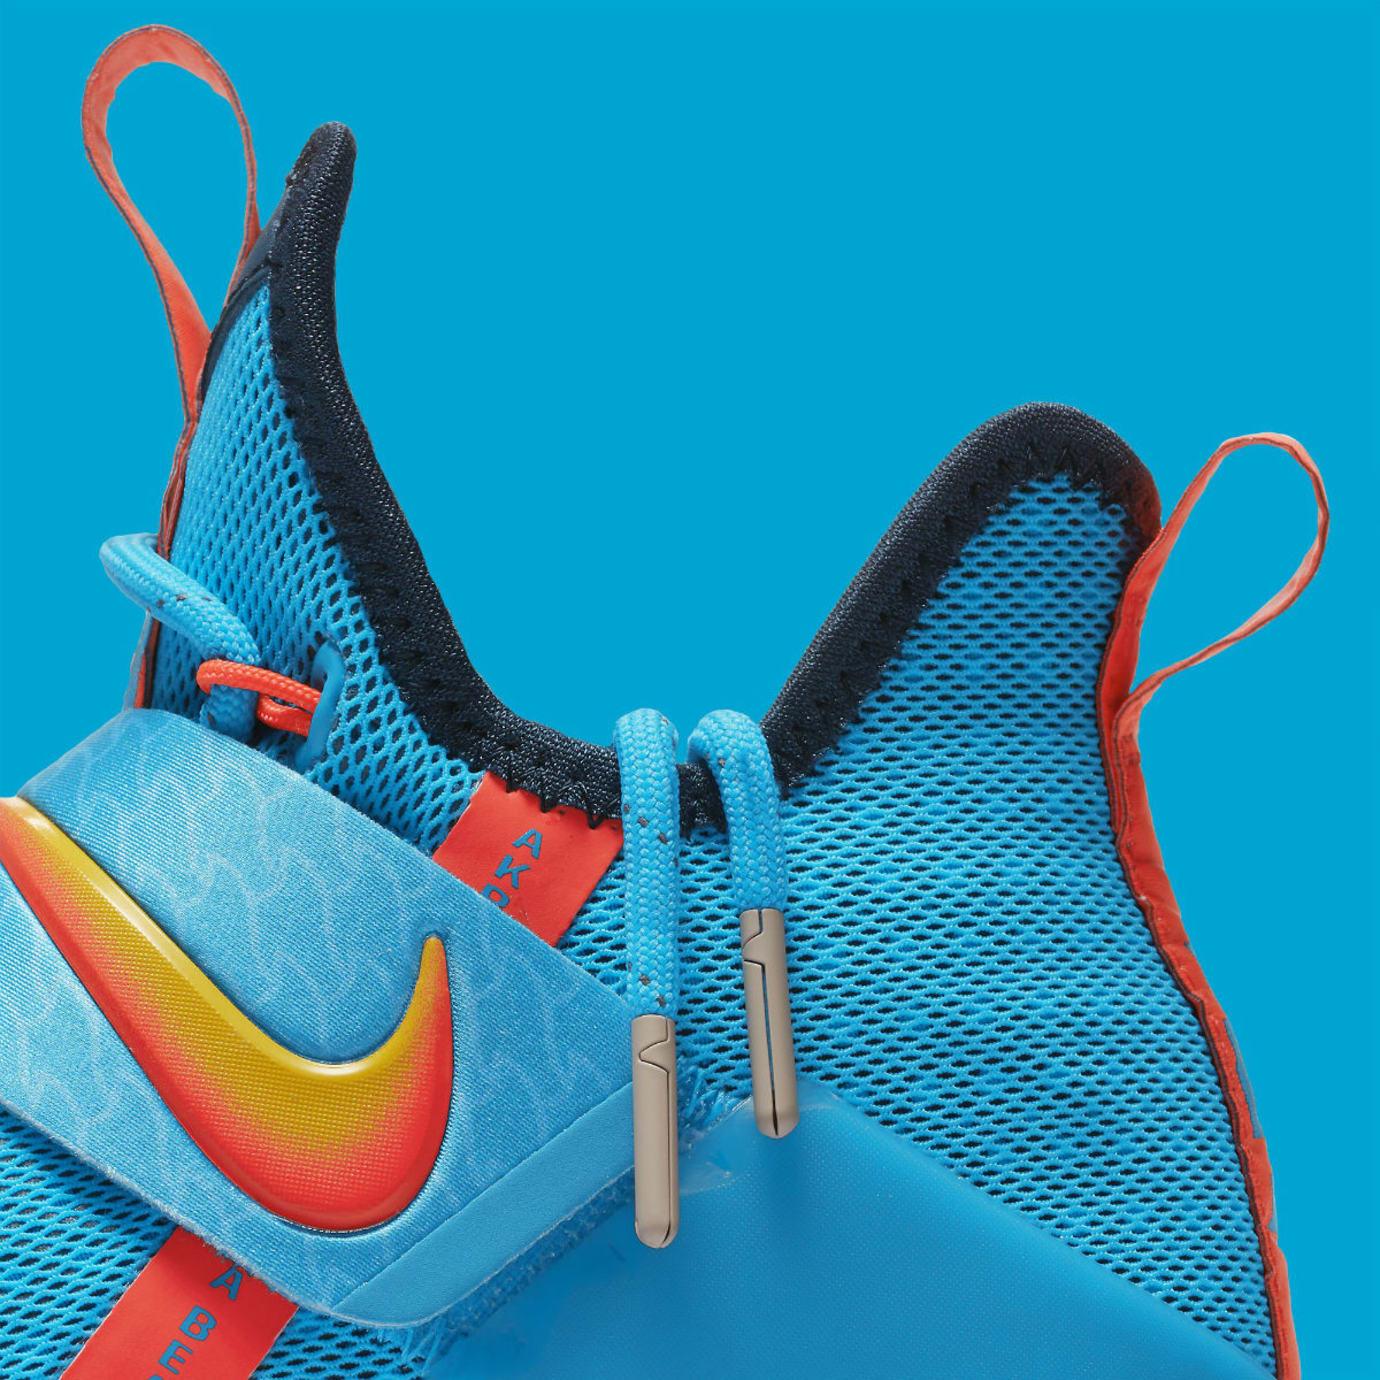 buy online 43a09 e77ad Nike LeBron 14 GS Cocoa Beach Release Date Collar 859468-477